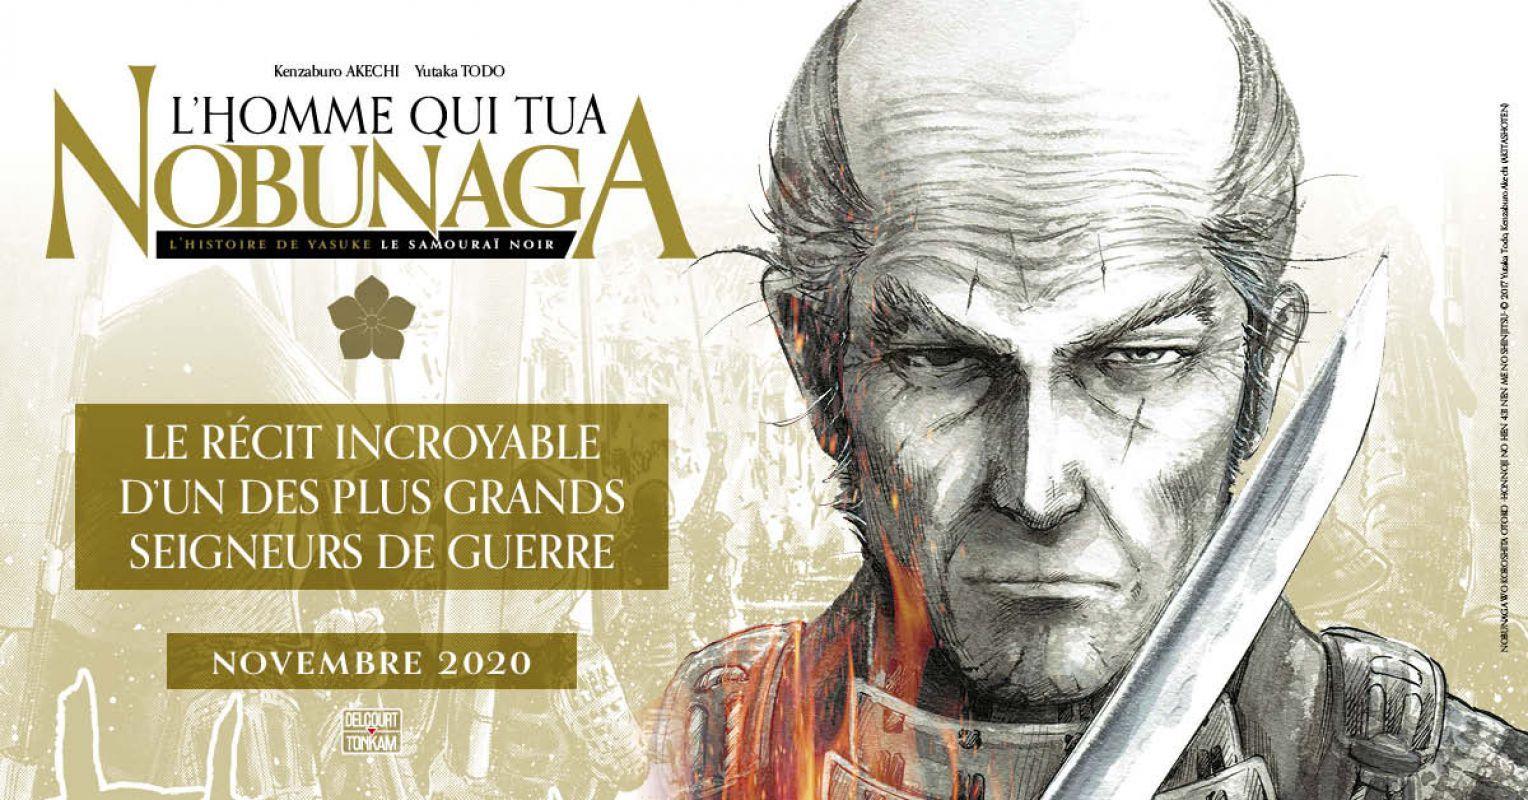 L'Homme Qui Tua Nobunaga chez Delcourt/Tonkam